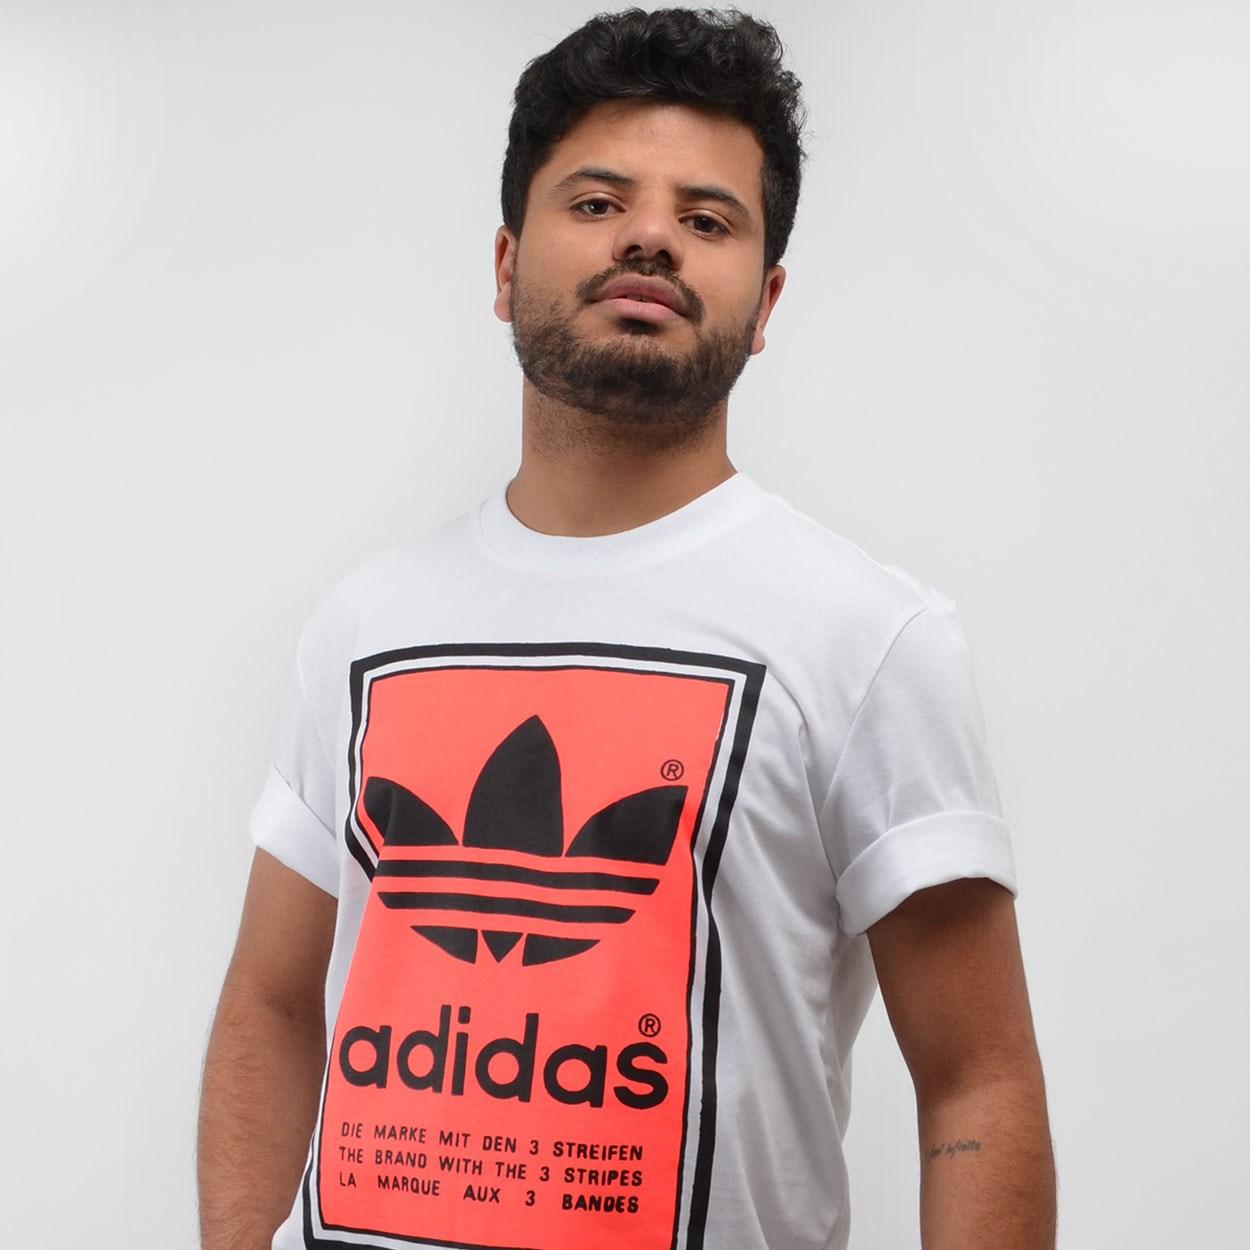 Tênis Adidas Originals Camiseta Boné Jaqueta Loja Virus 41